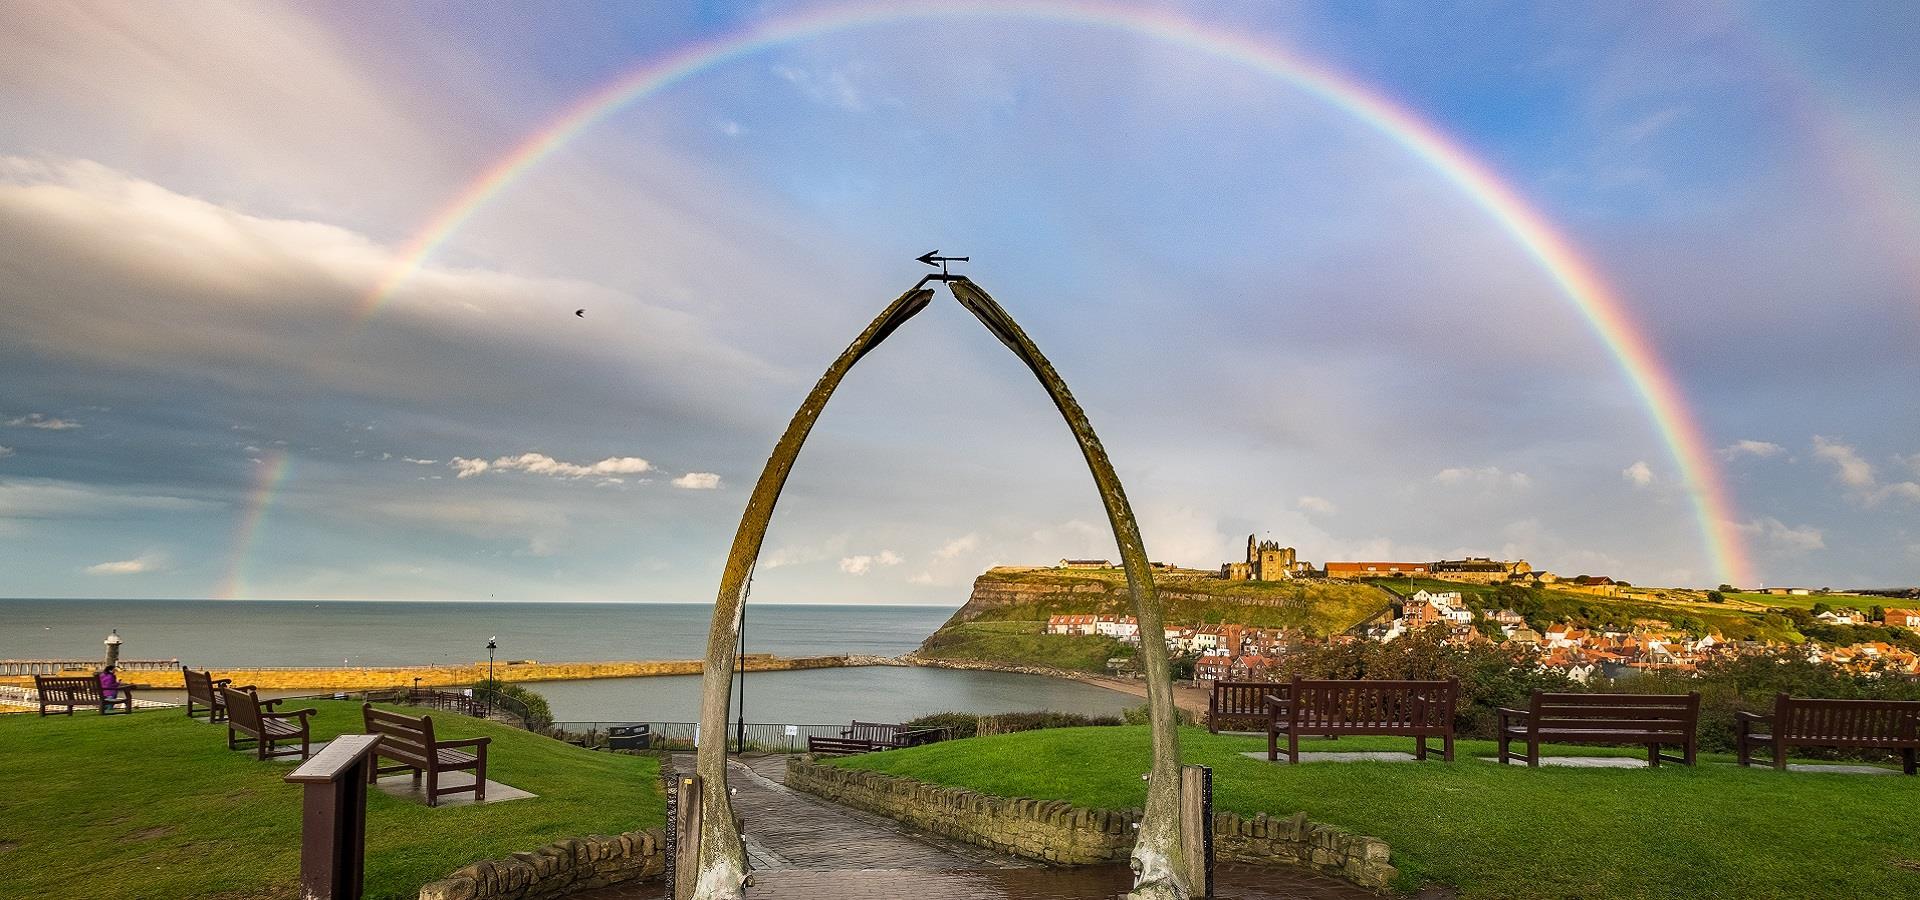 Rainbow over the Whalebone Arch, Whitby by Glenn Kilpatrick